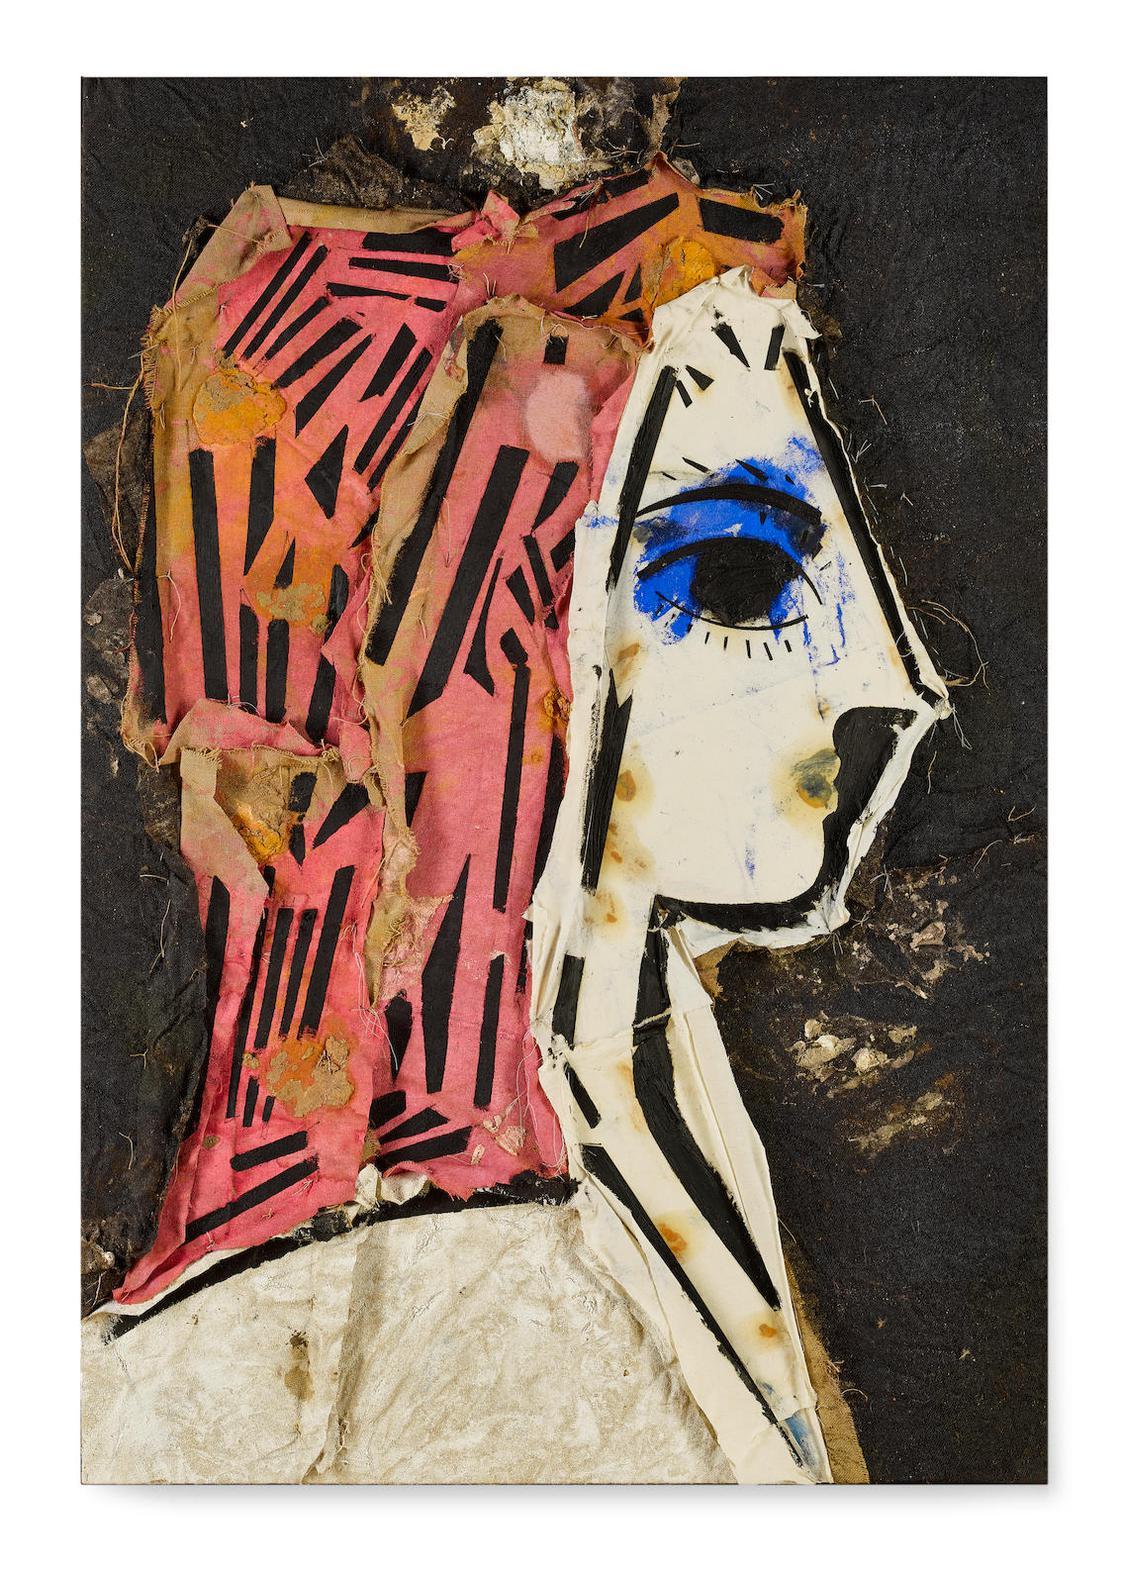 Manolo Valdes-A Menage A Picasso-2011